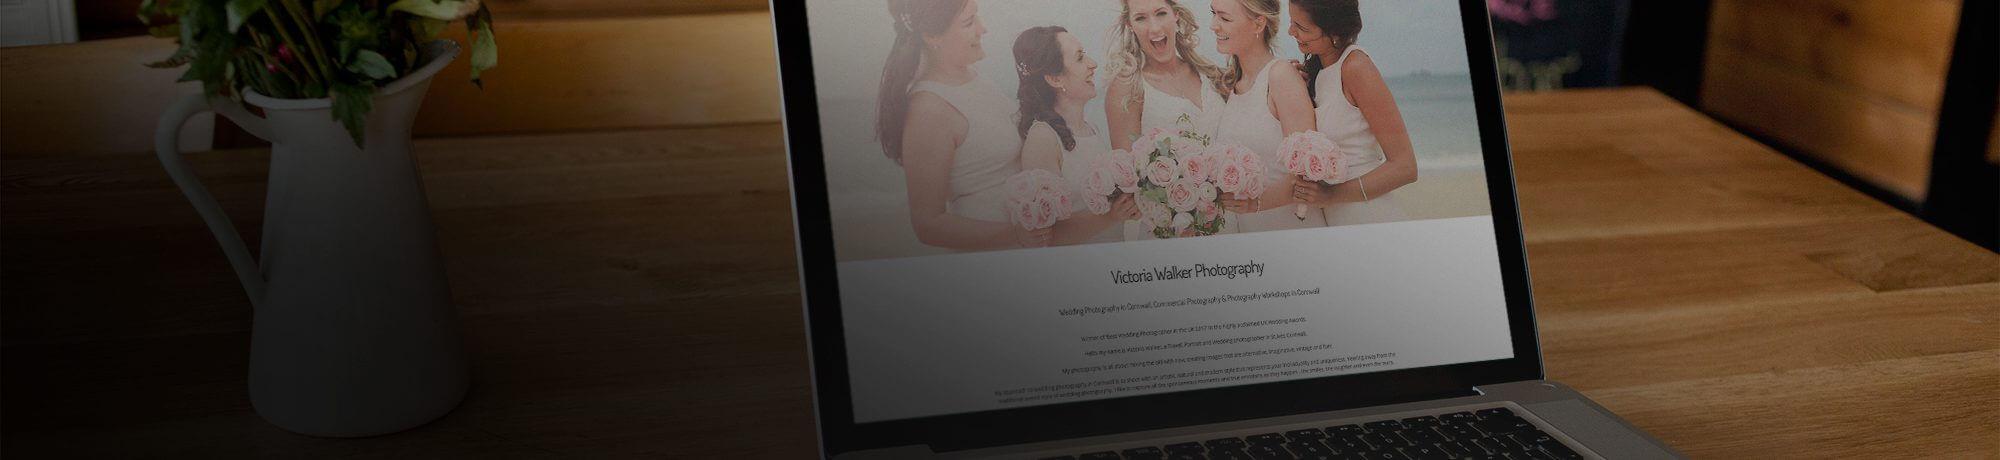 victoria walker photography website main 2000x460 - Victoria Walker Photography